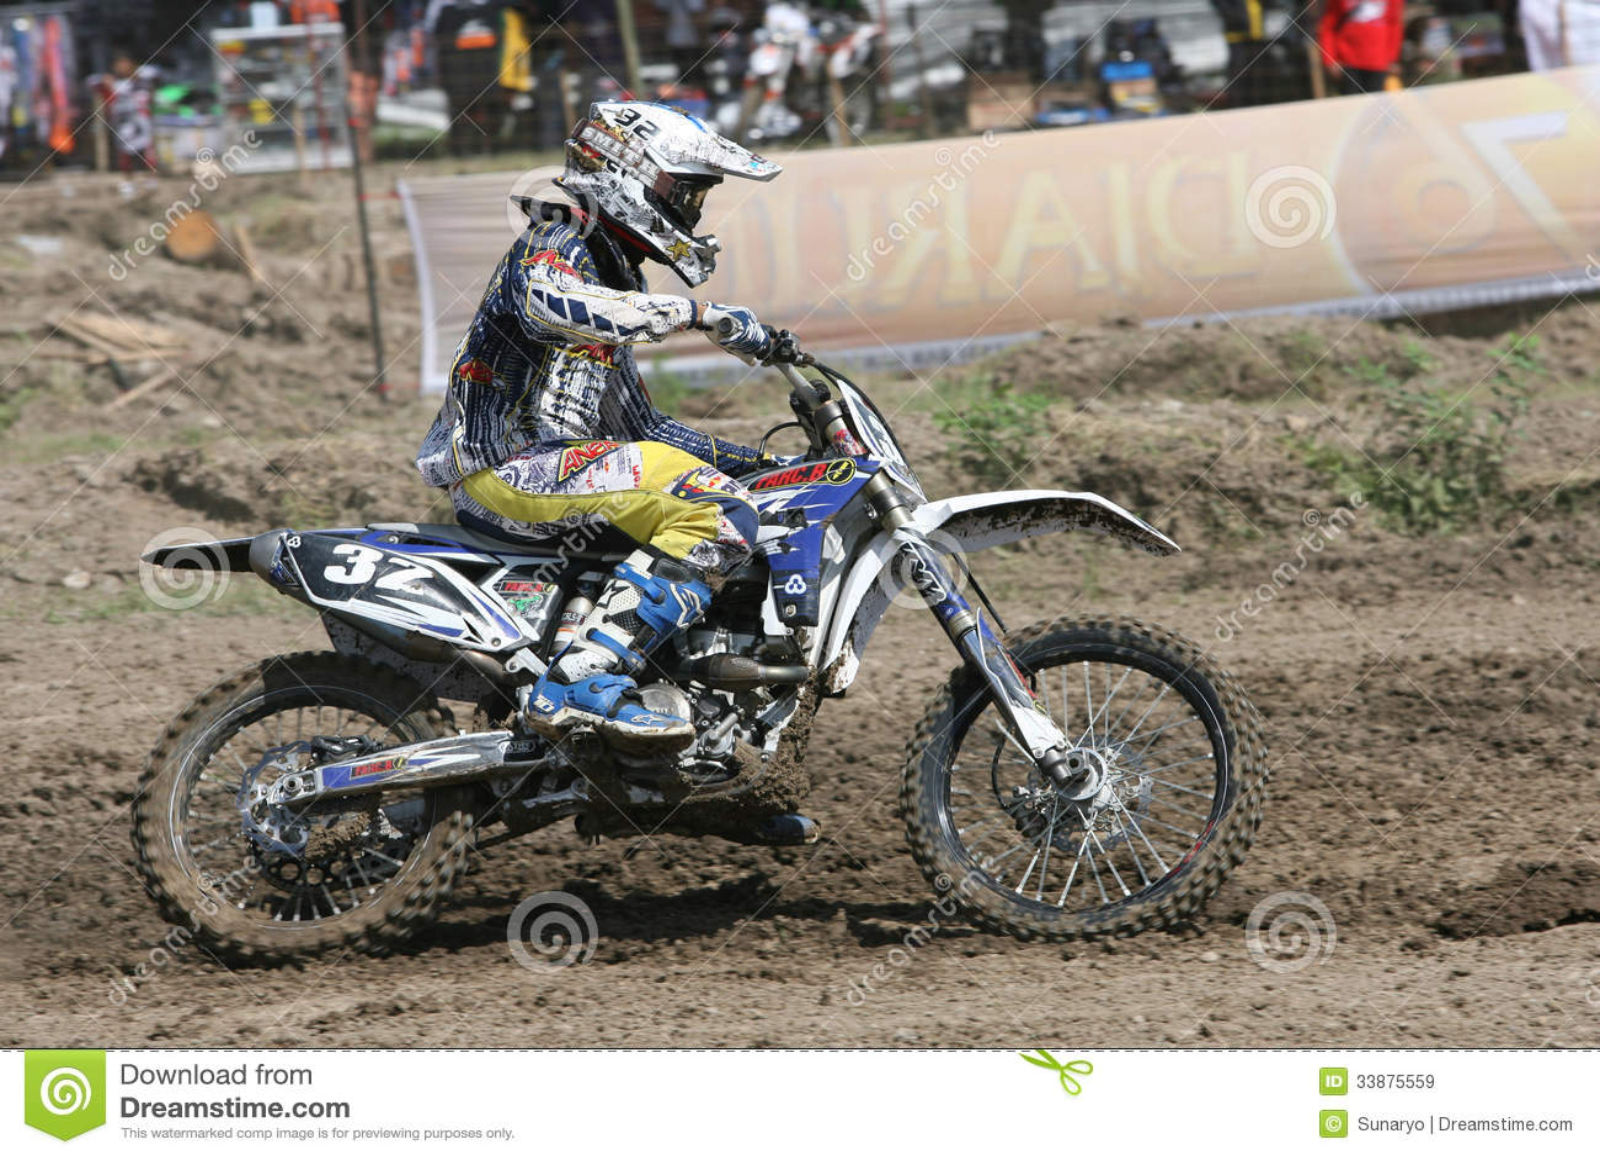 Motorcross Editorial Stock Image Image Of Racer Race 33875559